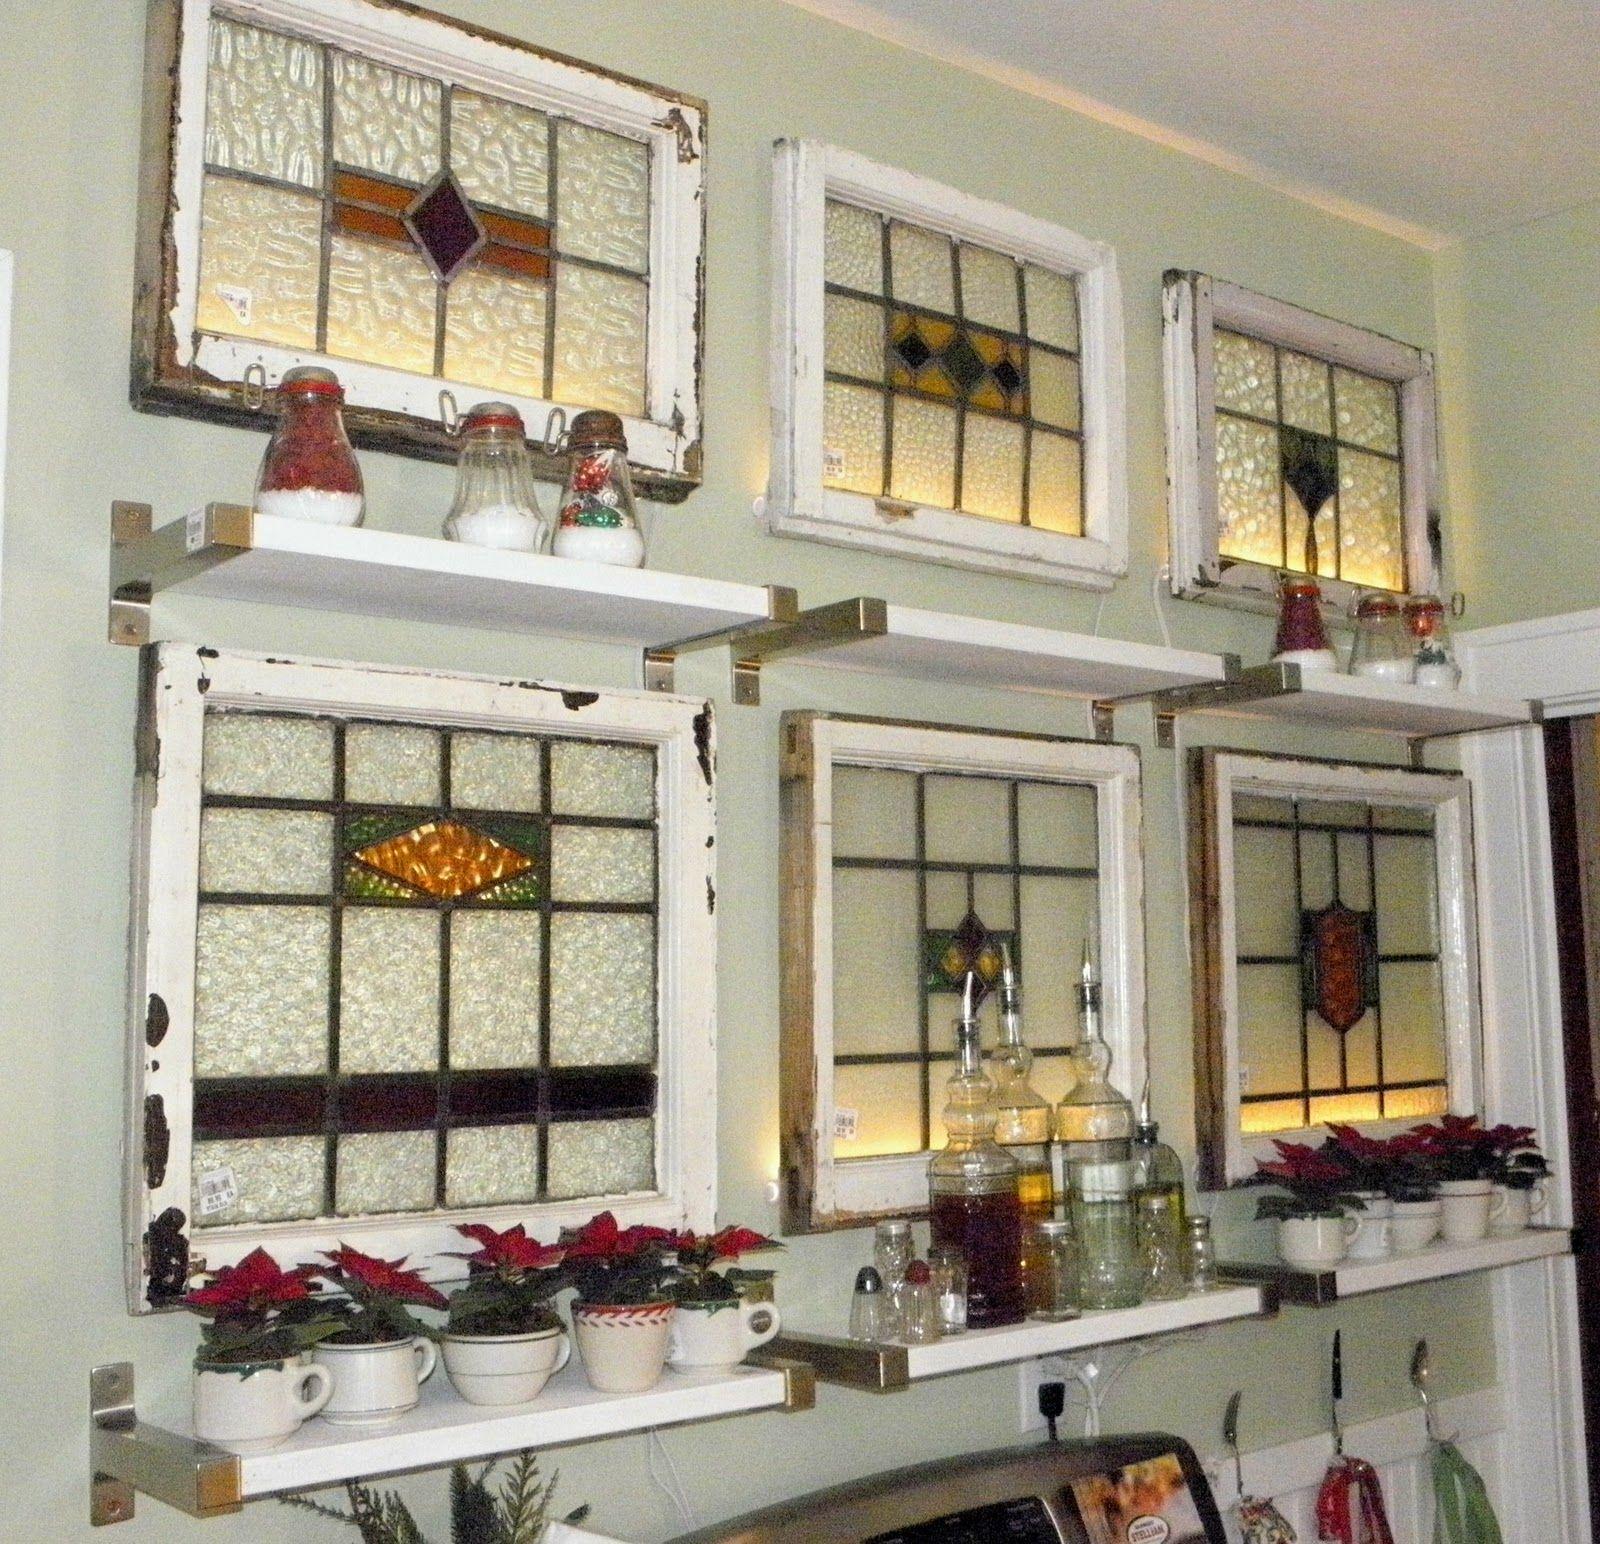 wall decor  Window decor, Leaded glass windows, Stained glass windows